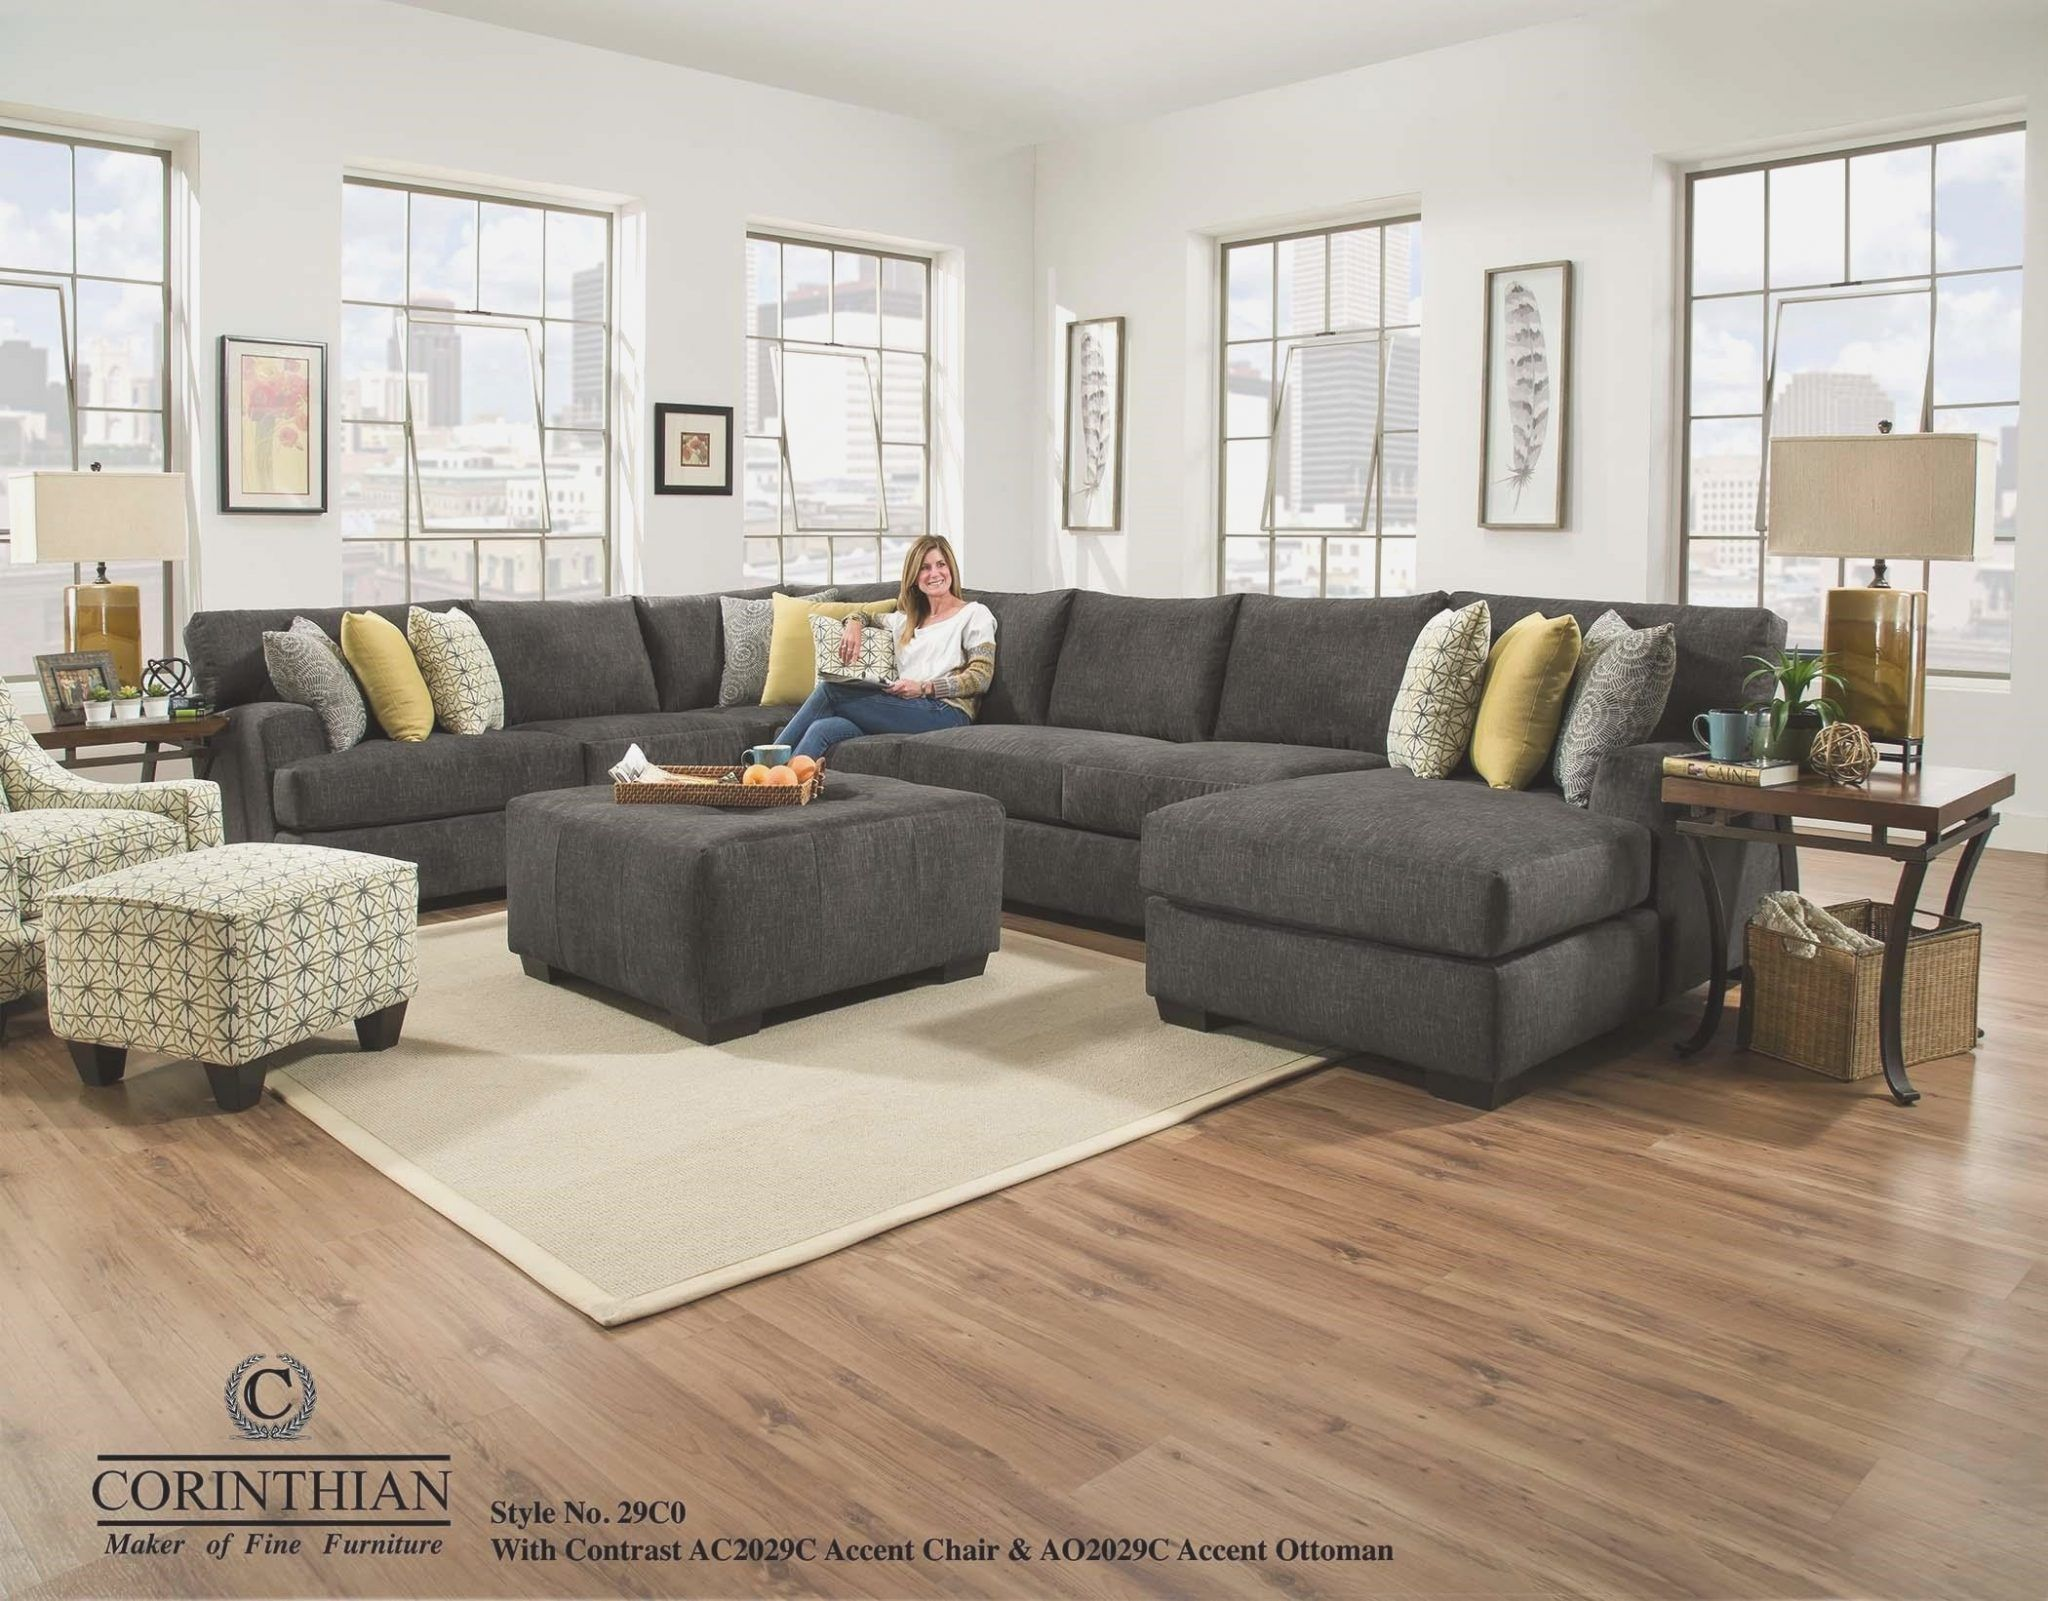 La Z Boy Sleeper Sofa With Air Mattress Bed Madison Wi Lazy Sleepers Furniture Pump